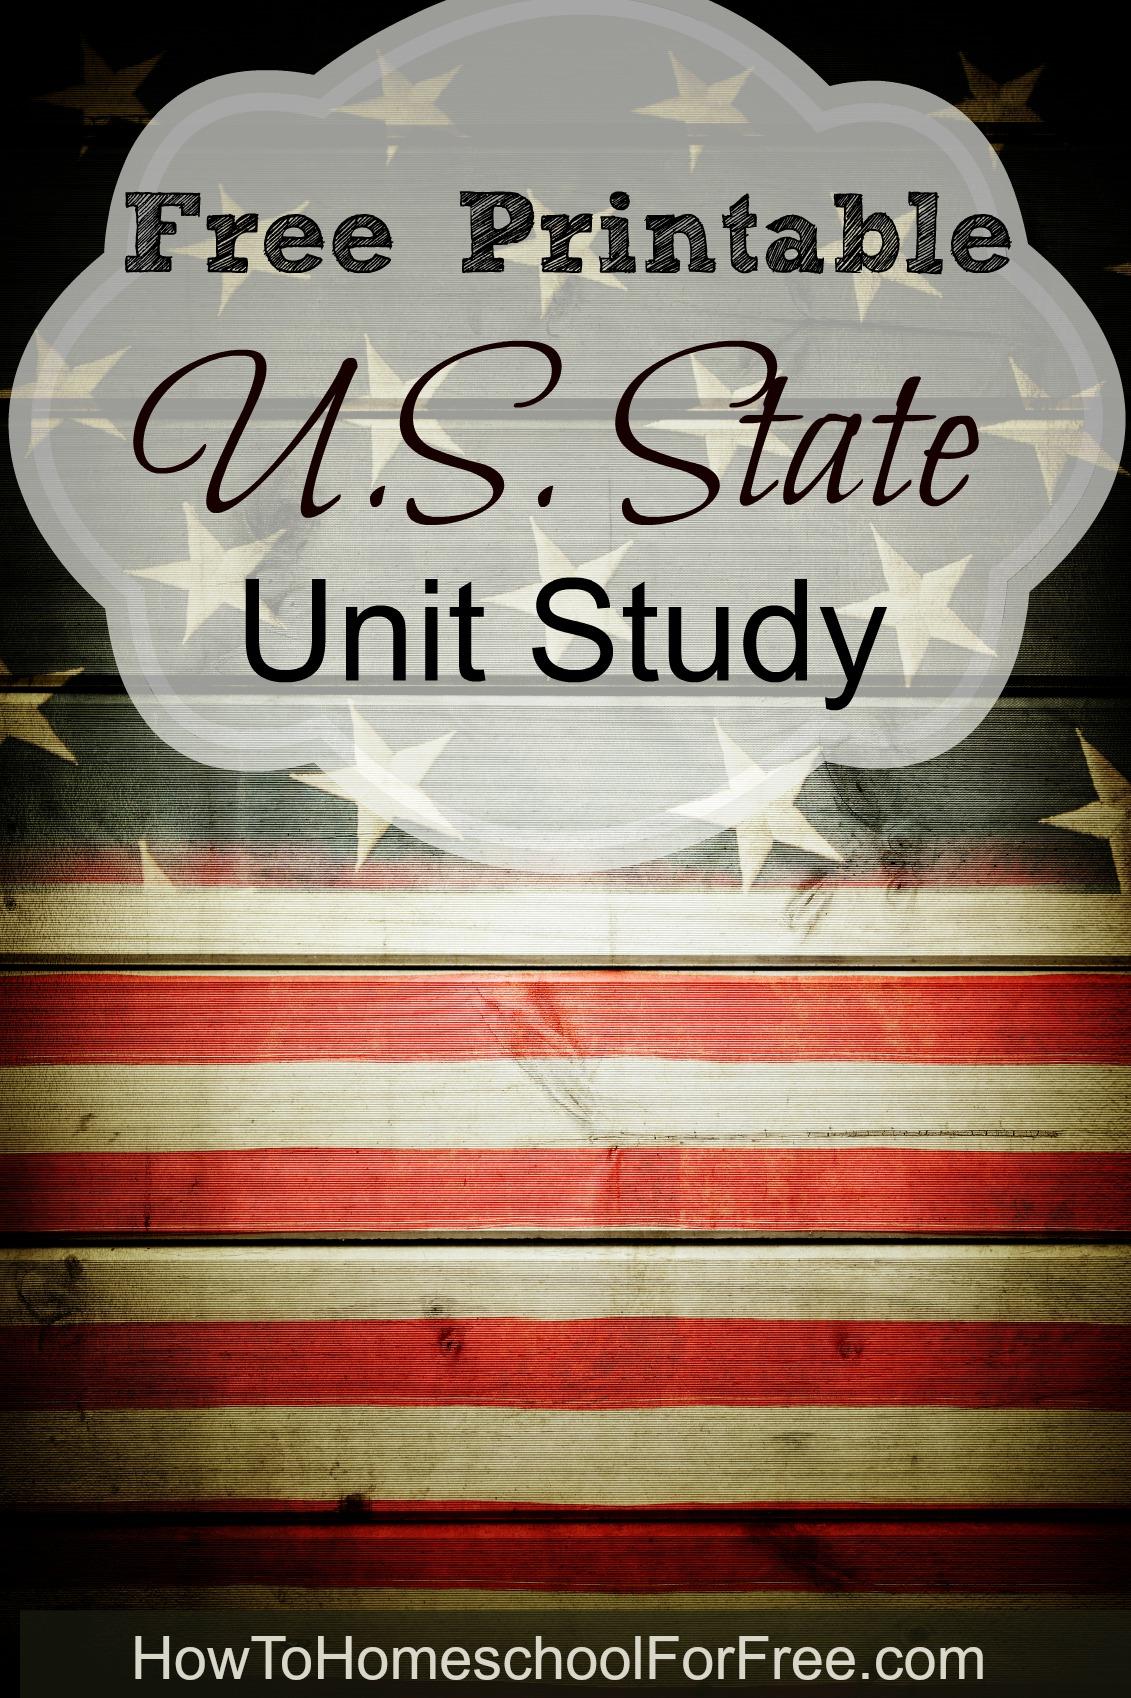 Free Printable U S State Unit Study